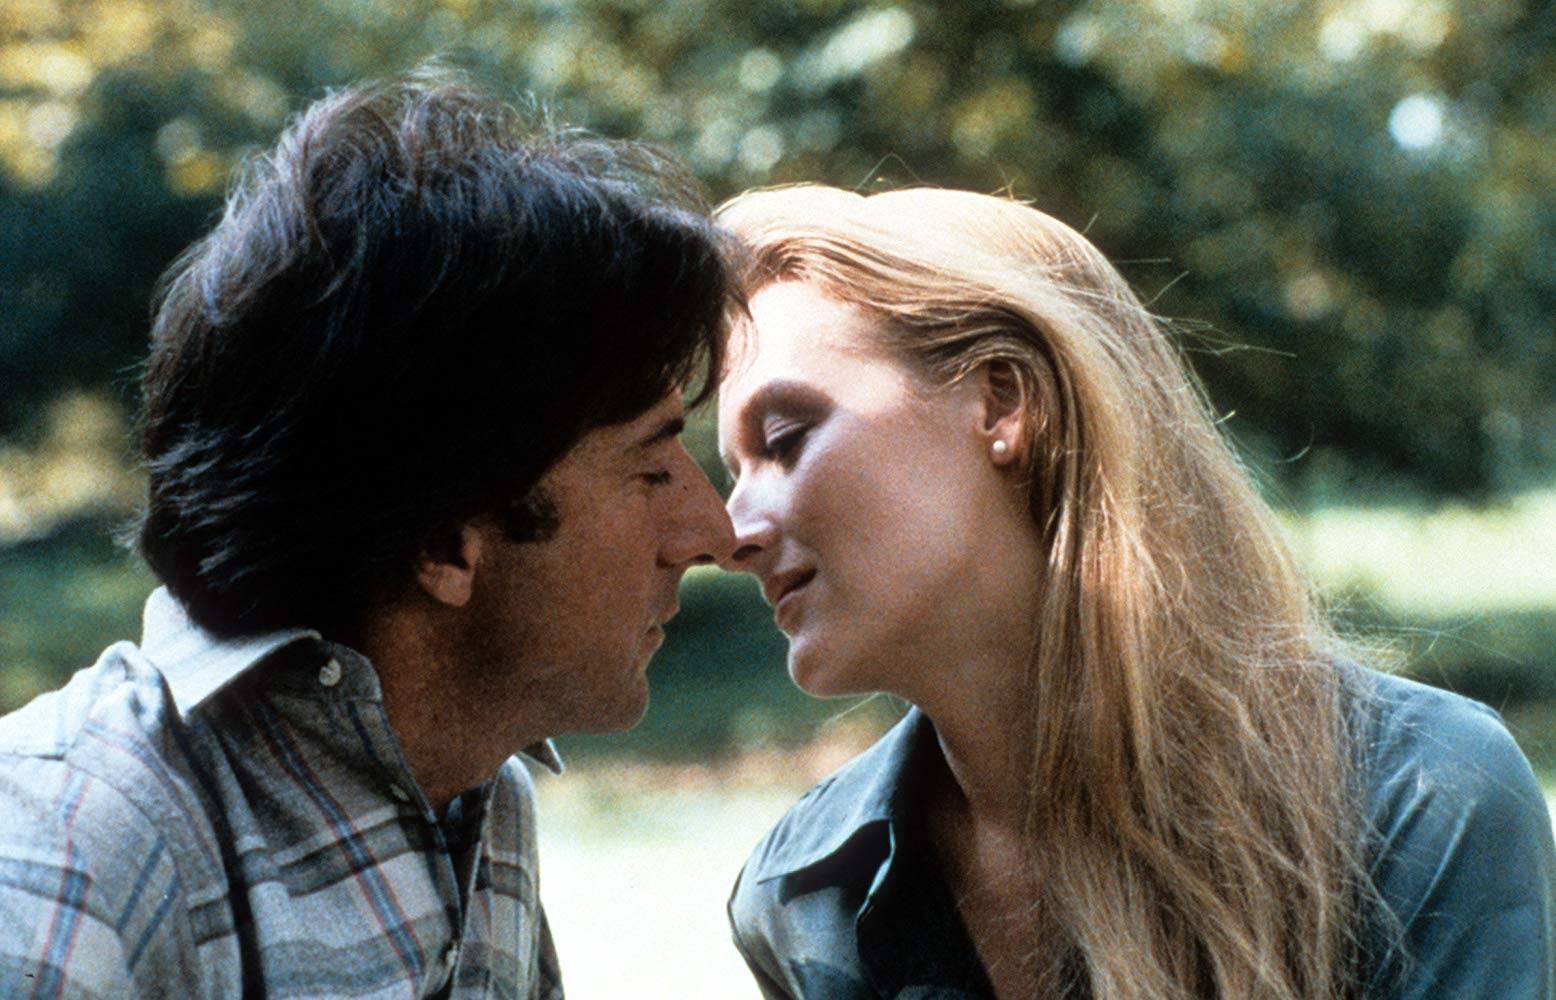 Migliore Film e Regia 1980 - Kramer contro Kramer